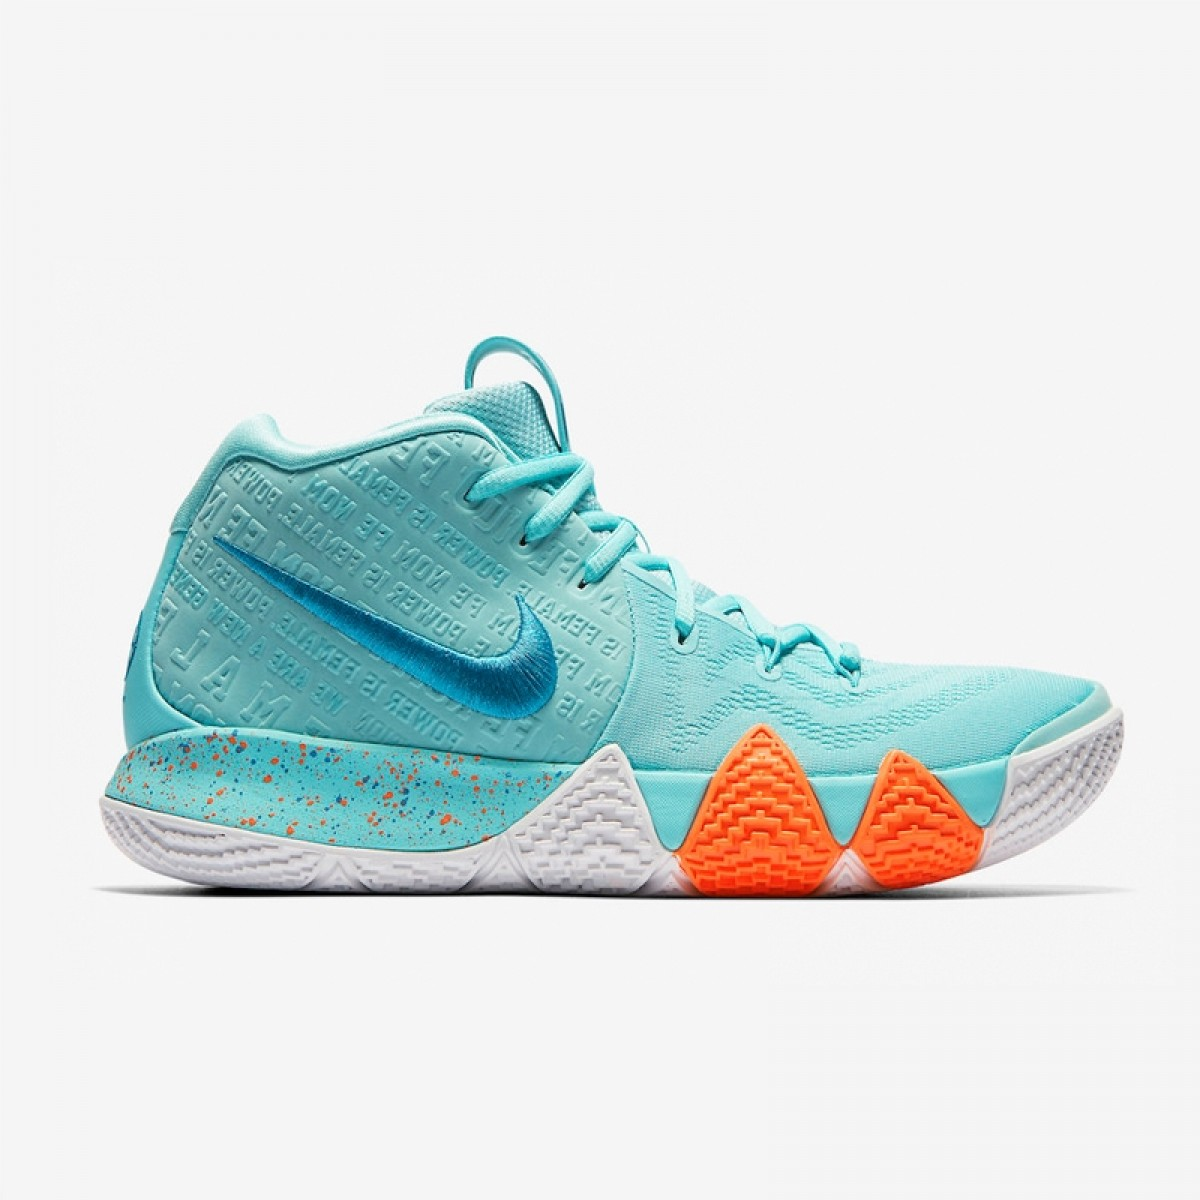 Nike Kyrie 4 'Power is Female'